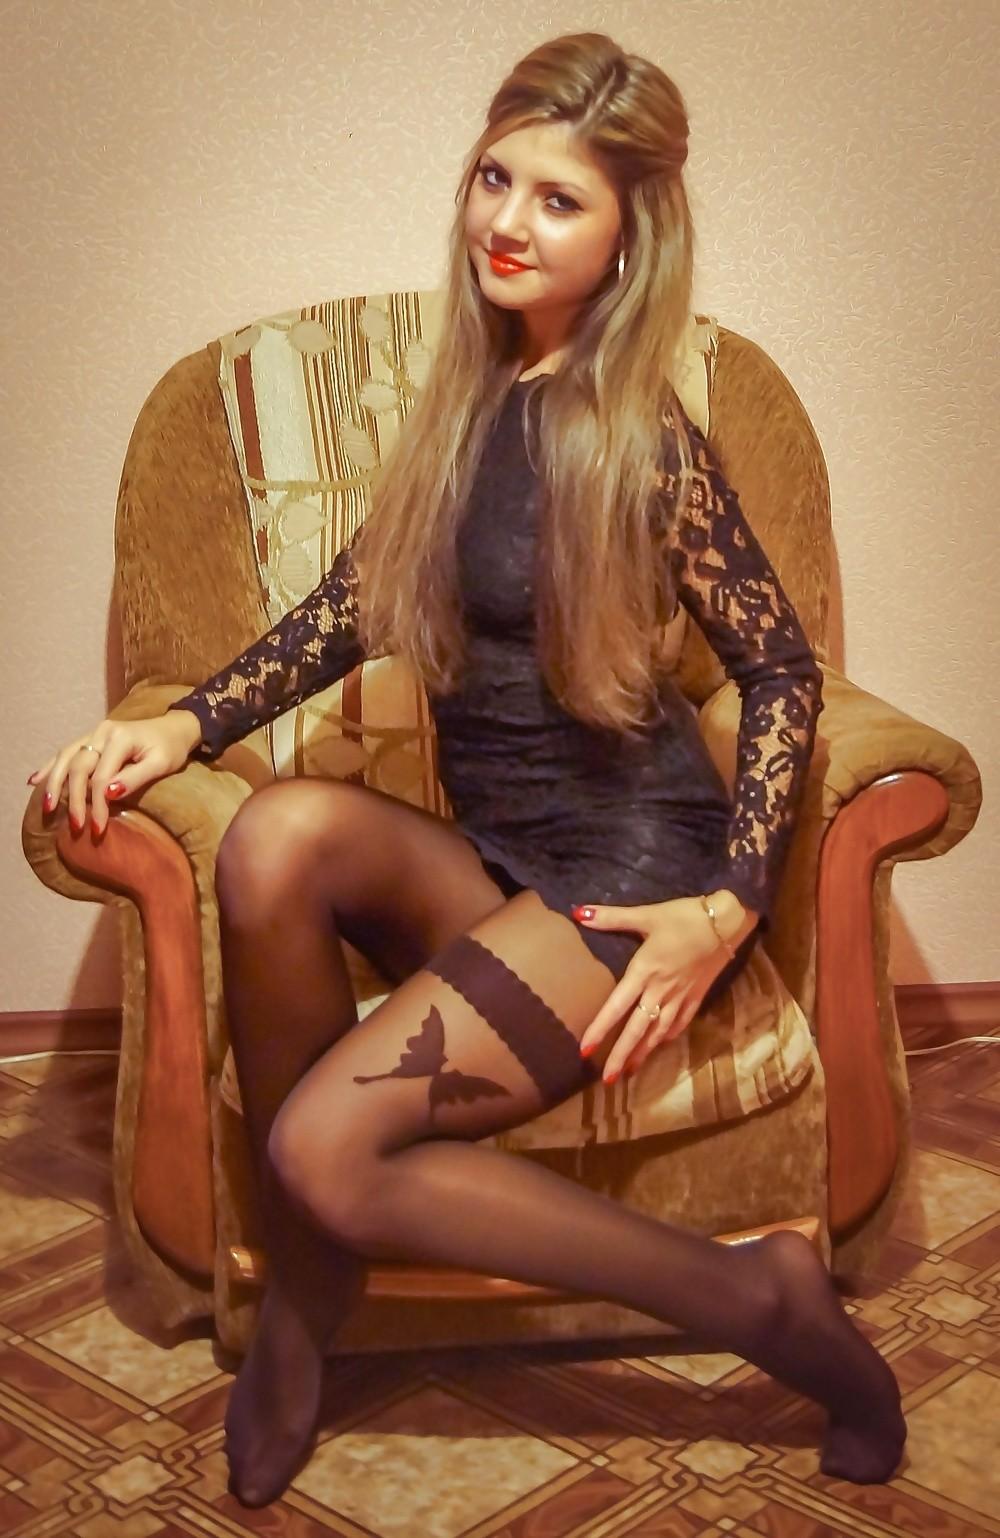 Галереи проституток фото день